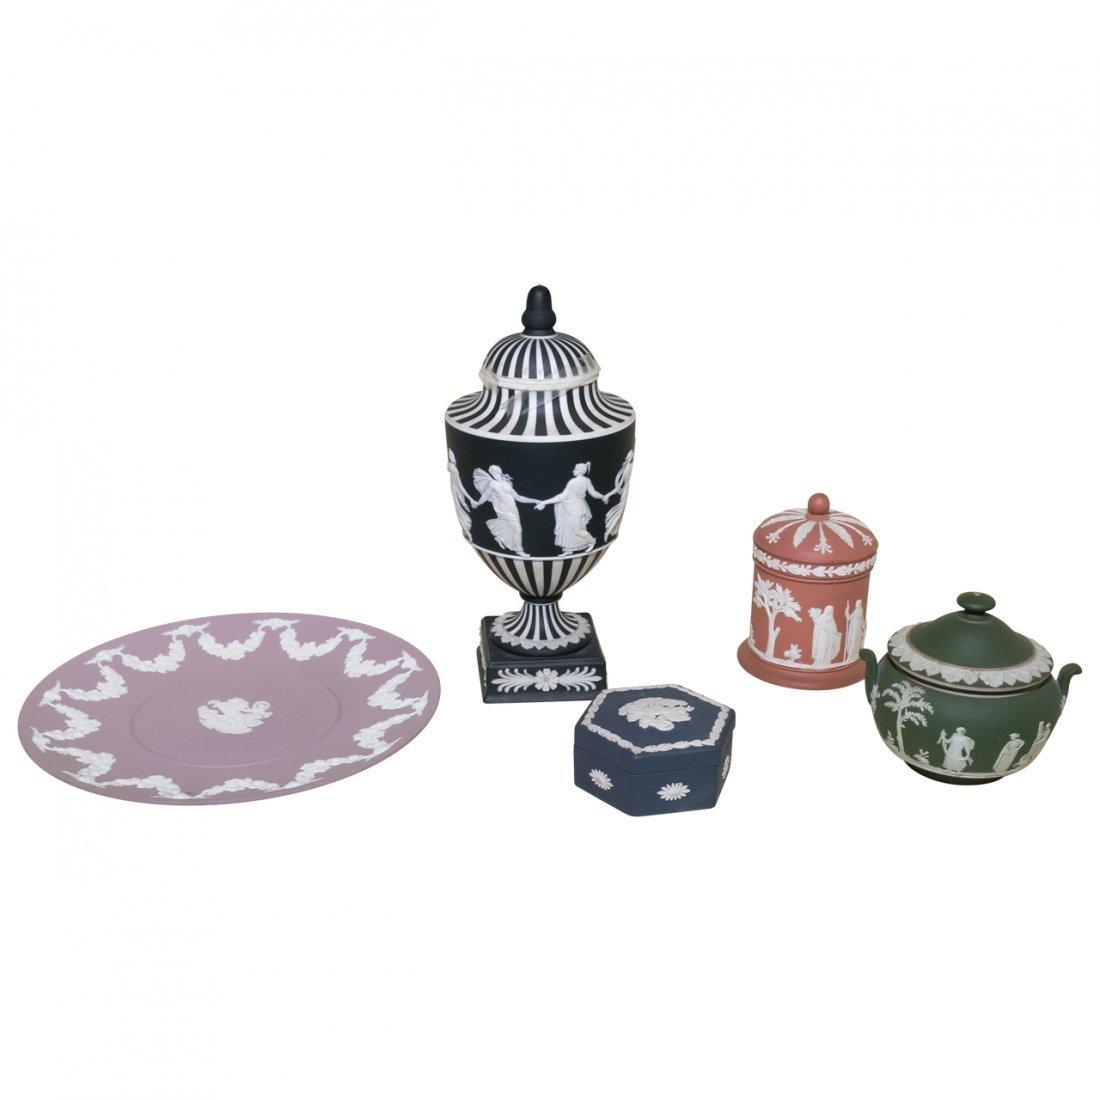 5 Pcs Antique Wedgwood Jasperware